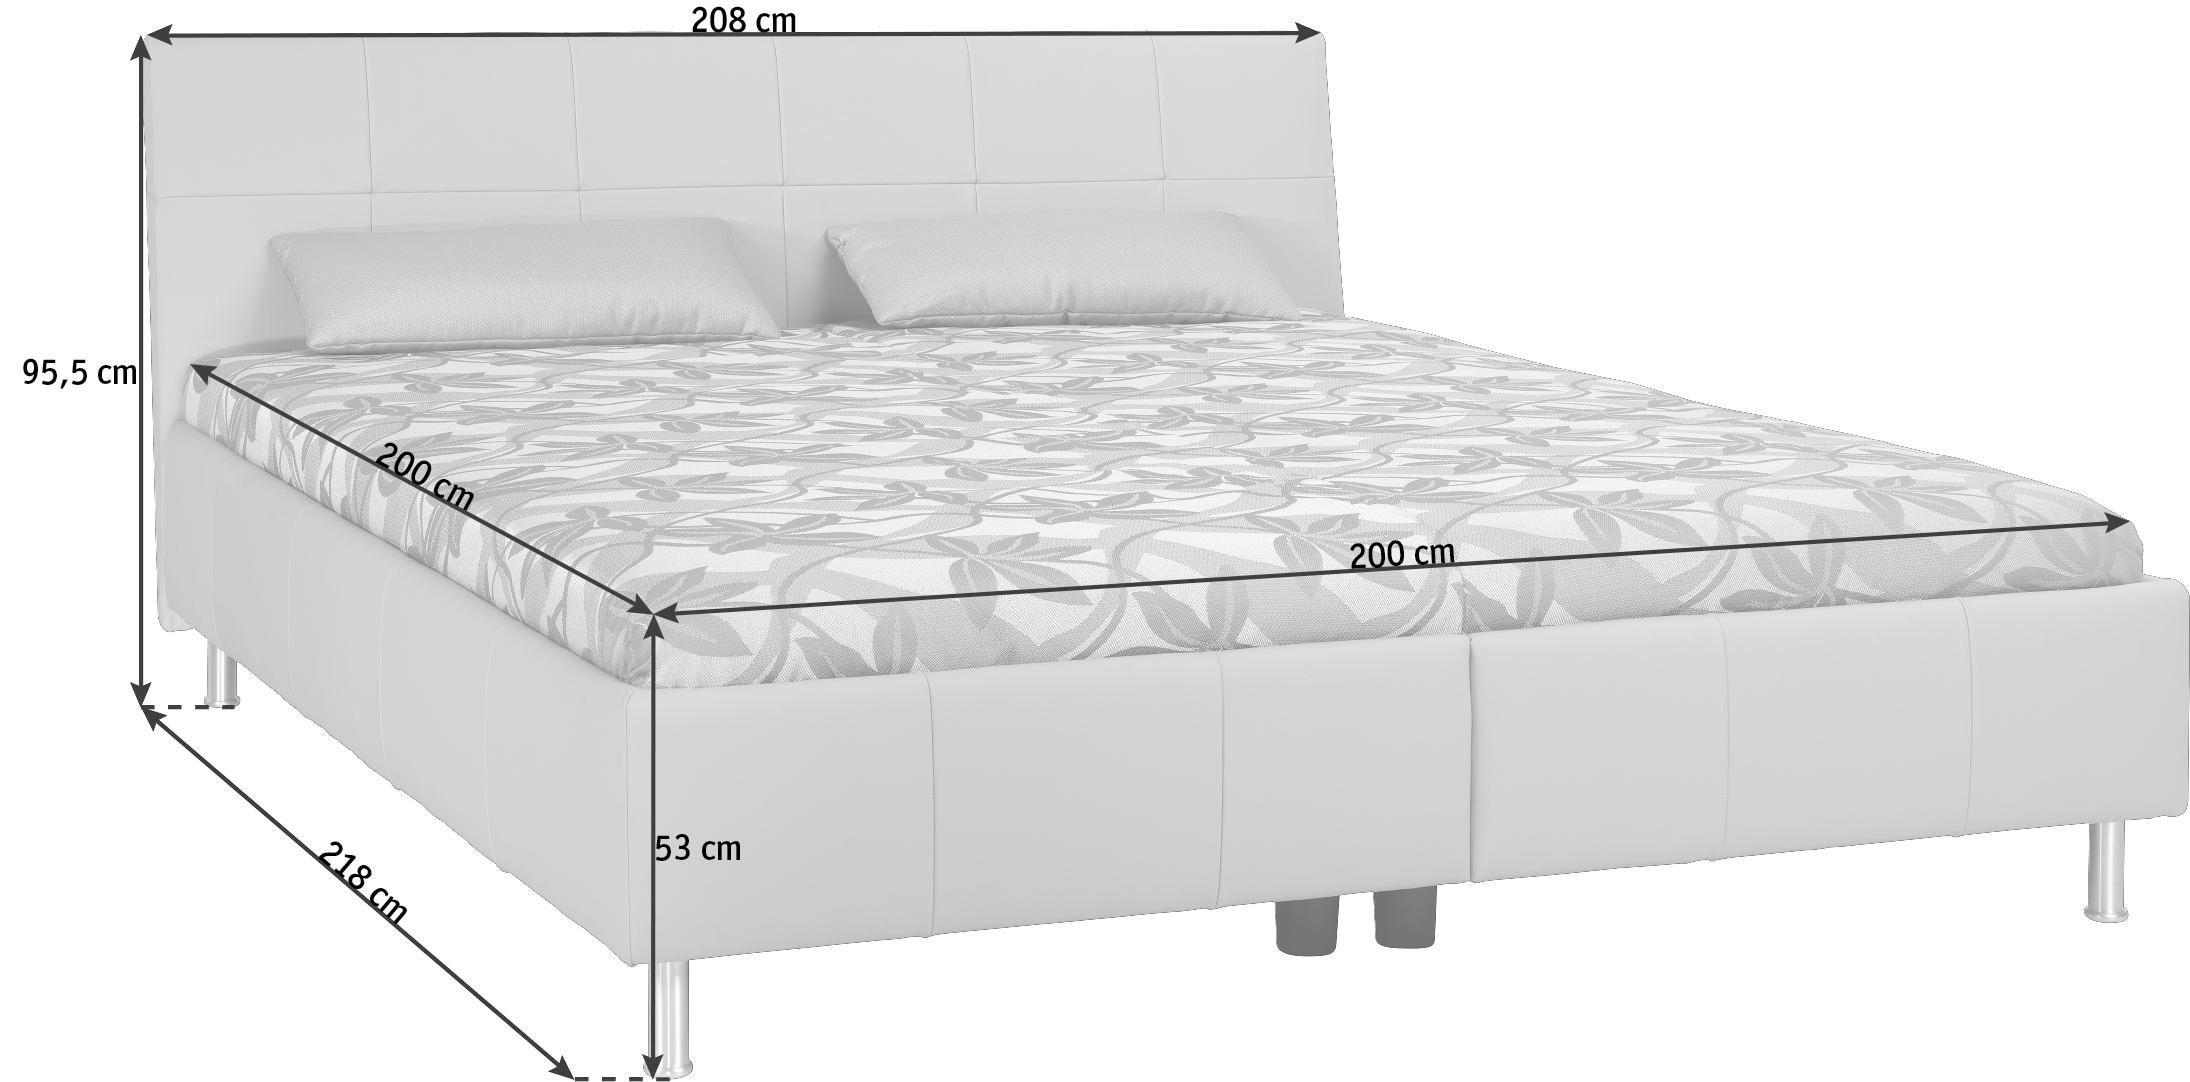 POLSTERBETT 200/200 cm - Alufarben/Grau, KONVENTIONELL, Leder/Textil (200/200cm) - ADA AUSTRIA